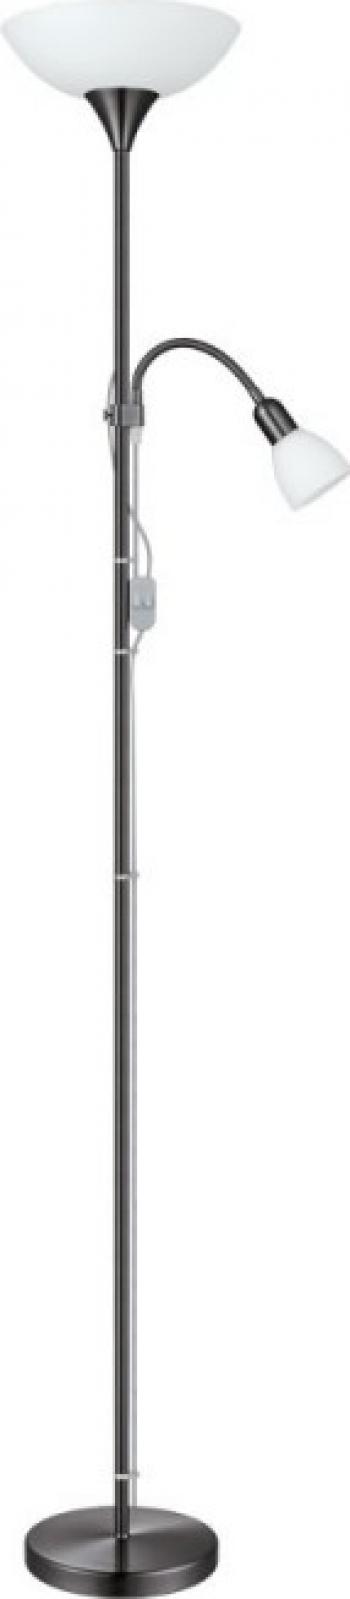 Lampadar EGLO UP2 93917 E27 60W E14 25W crom fumuriu